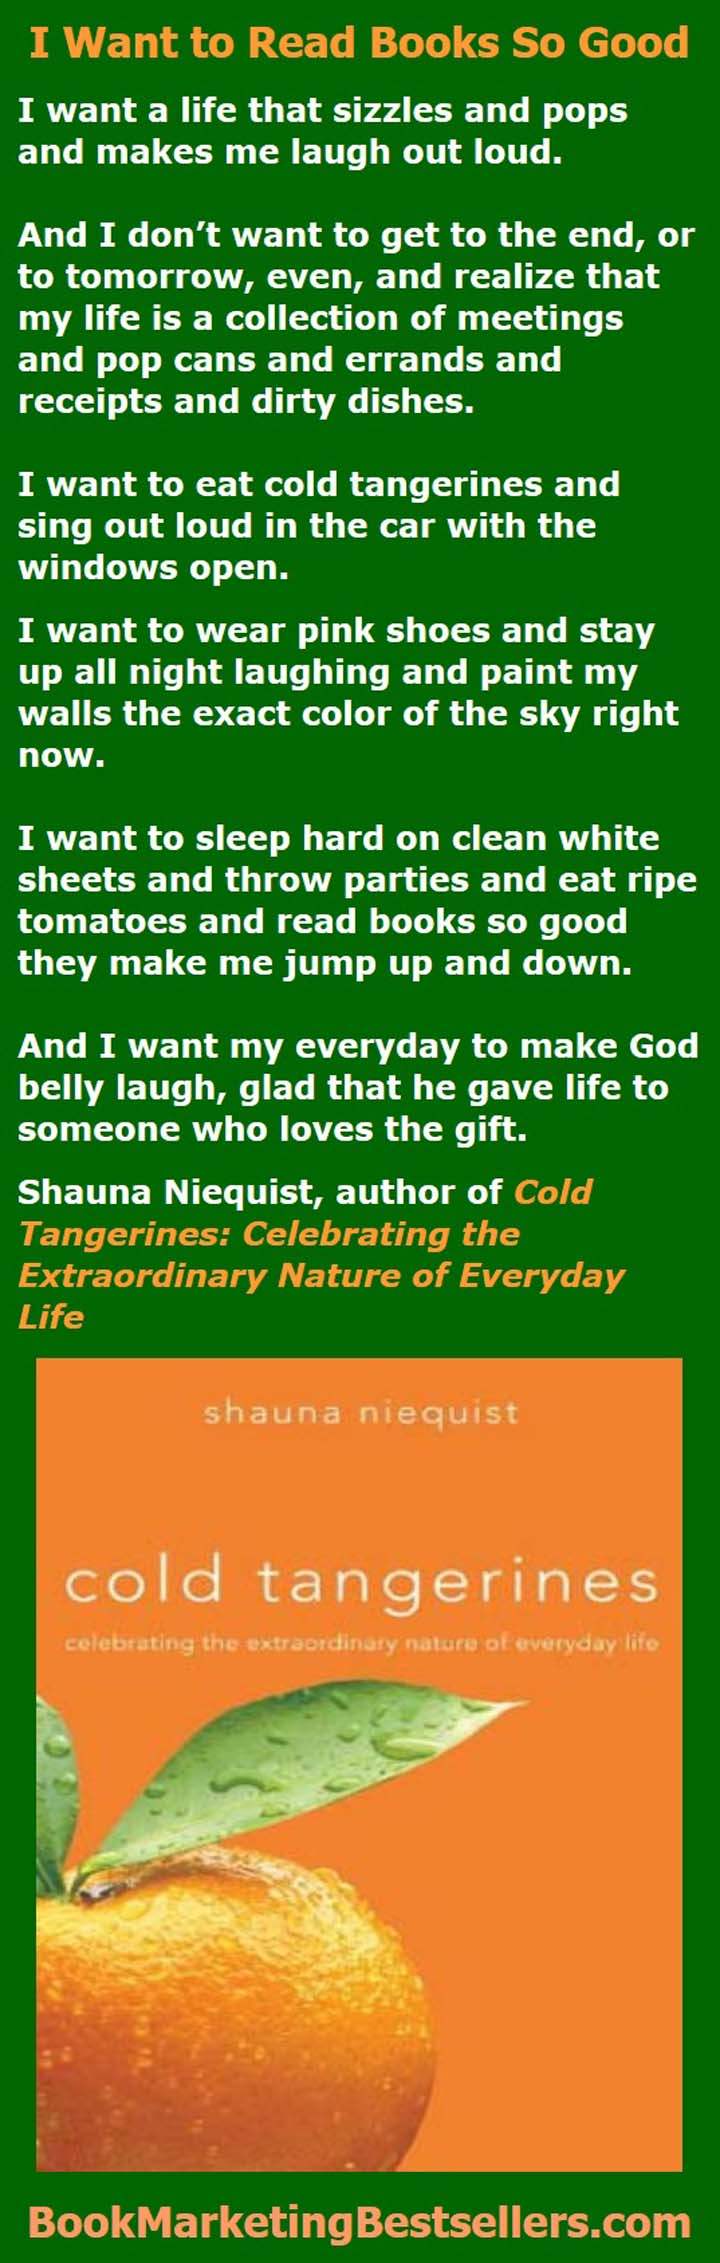 Shauna Niequist's Cold Tangerines